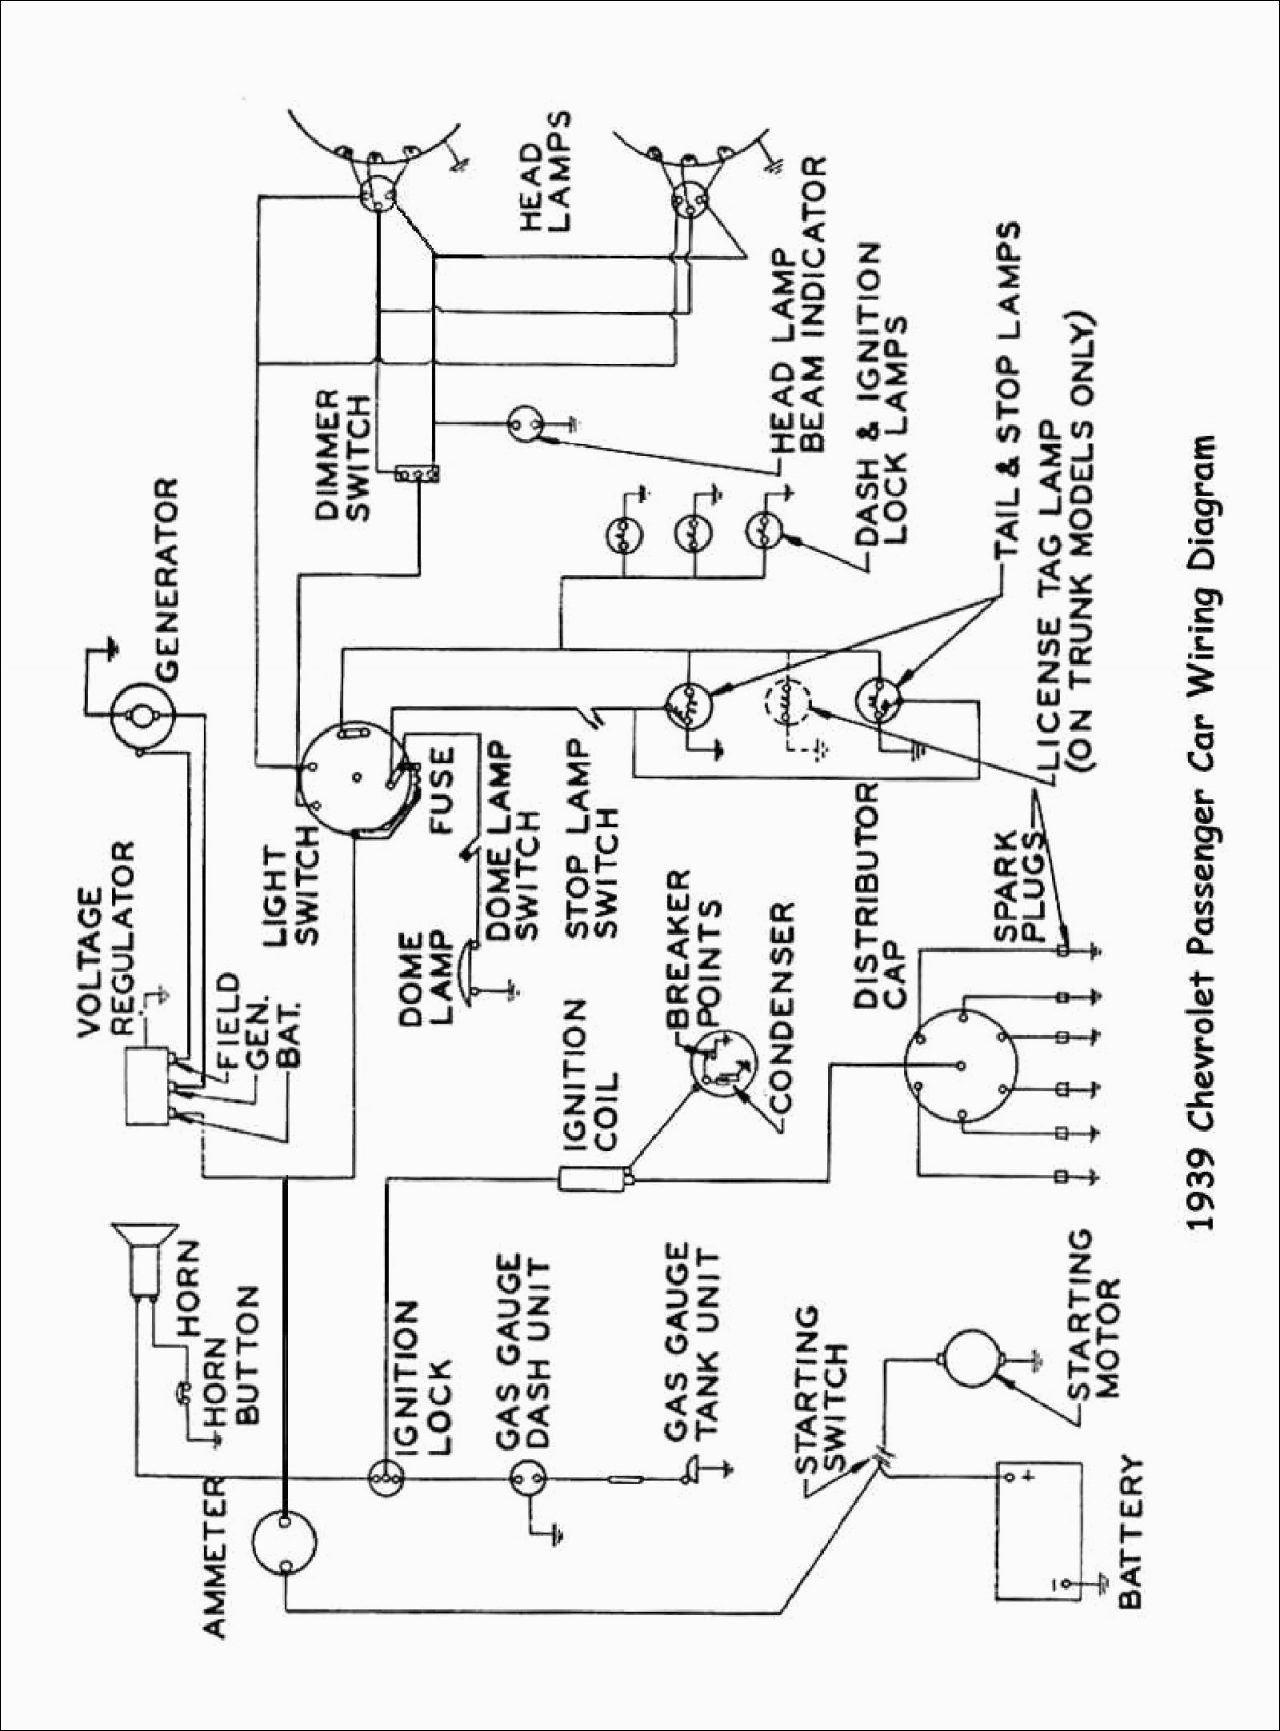 Unique Gm Ac Wiring Diagram | Electrical wiring diagram ...